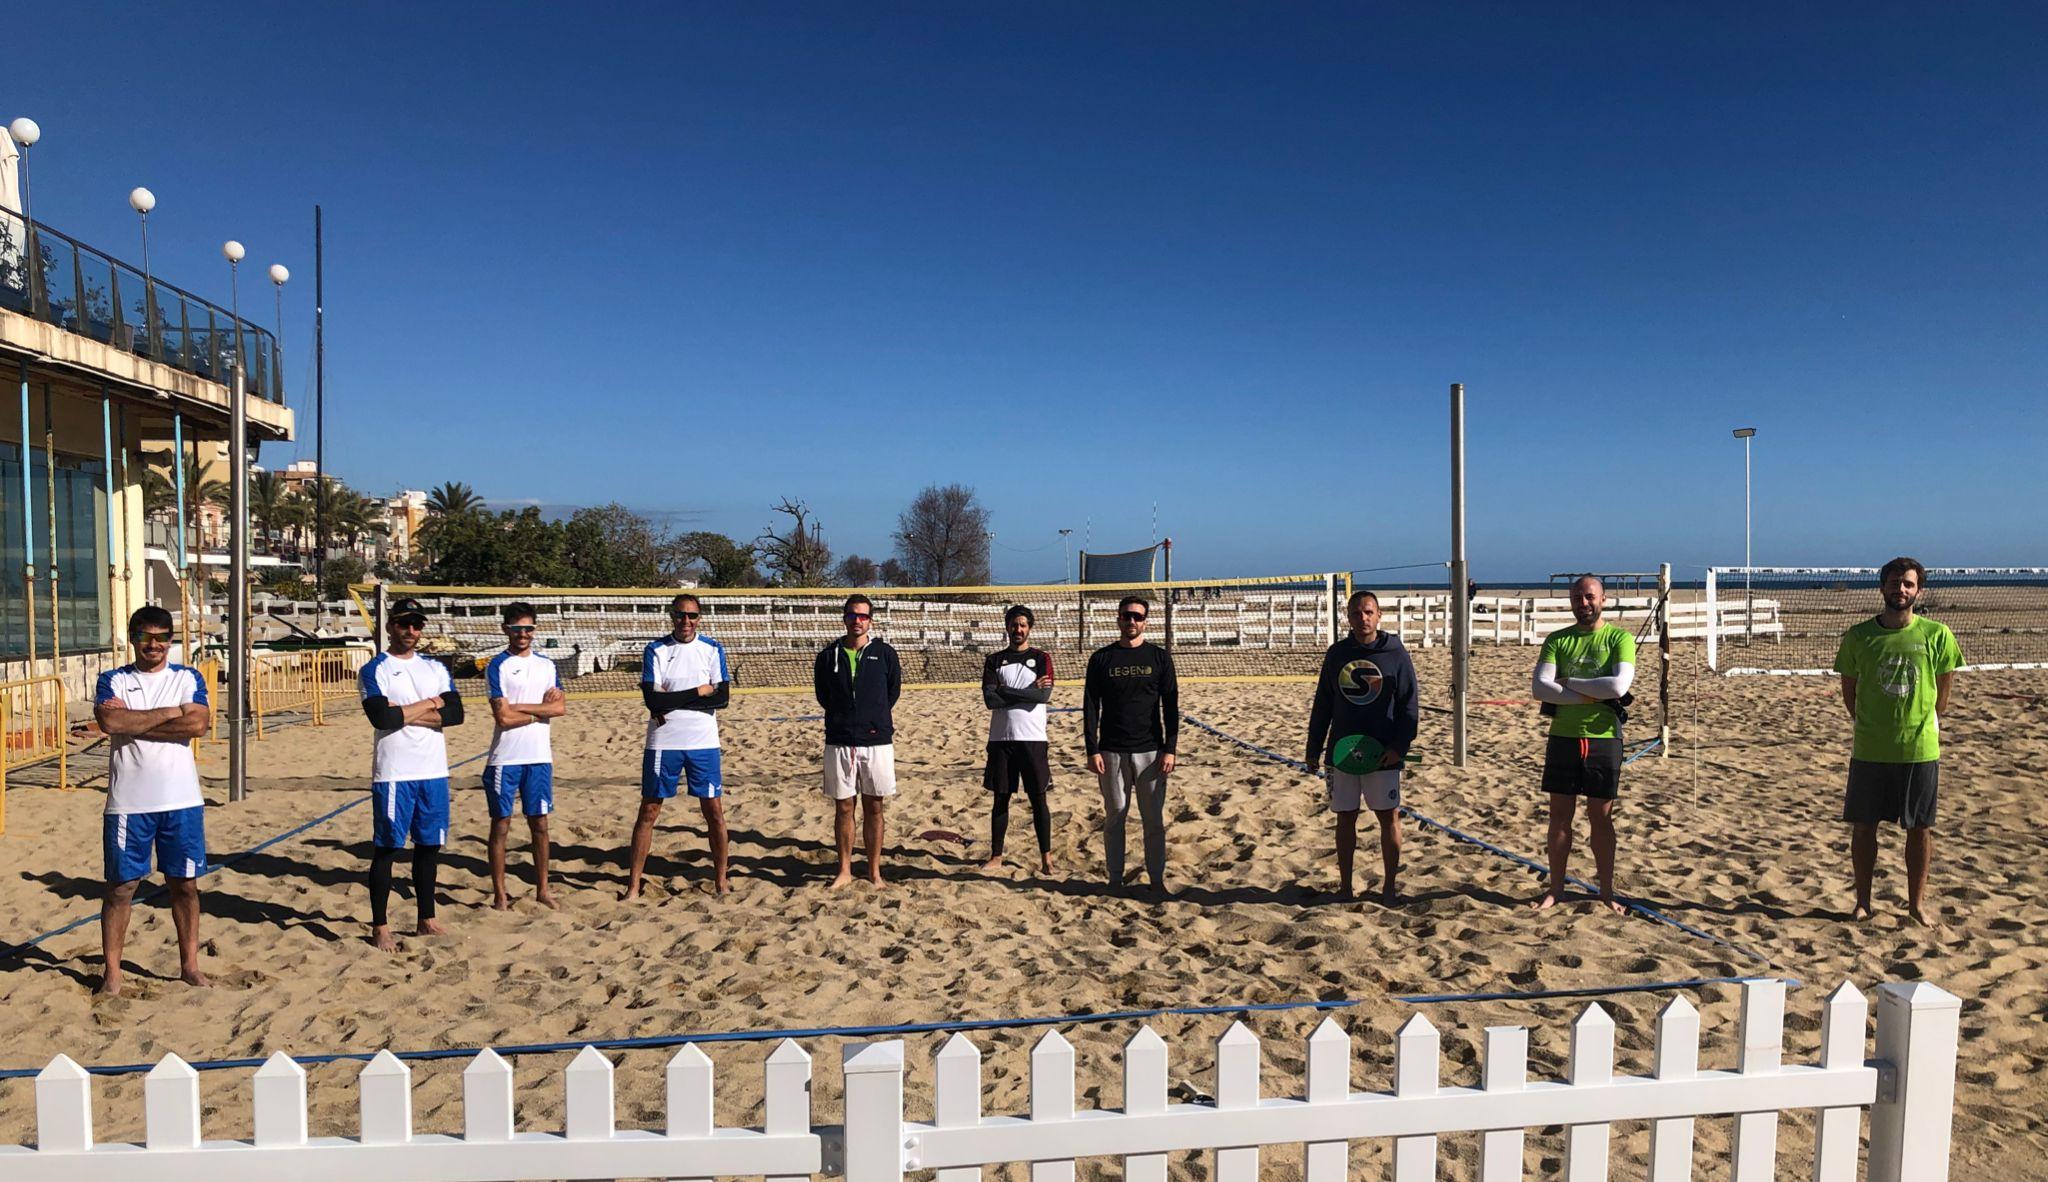 Lliga Catalana de Beach Tennis - Jornada 3: 24/01/2021 - 2021, beach tennis, cnem, platja, tennis, tennis platja - lliga catalana tennis platja